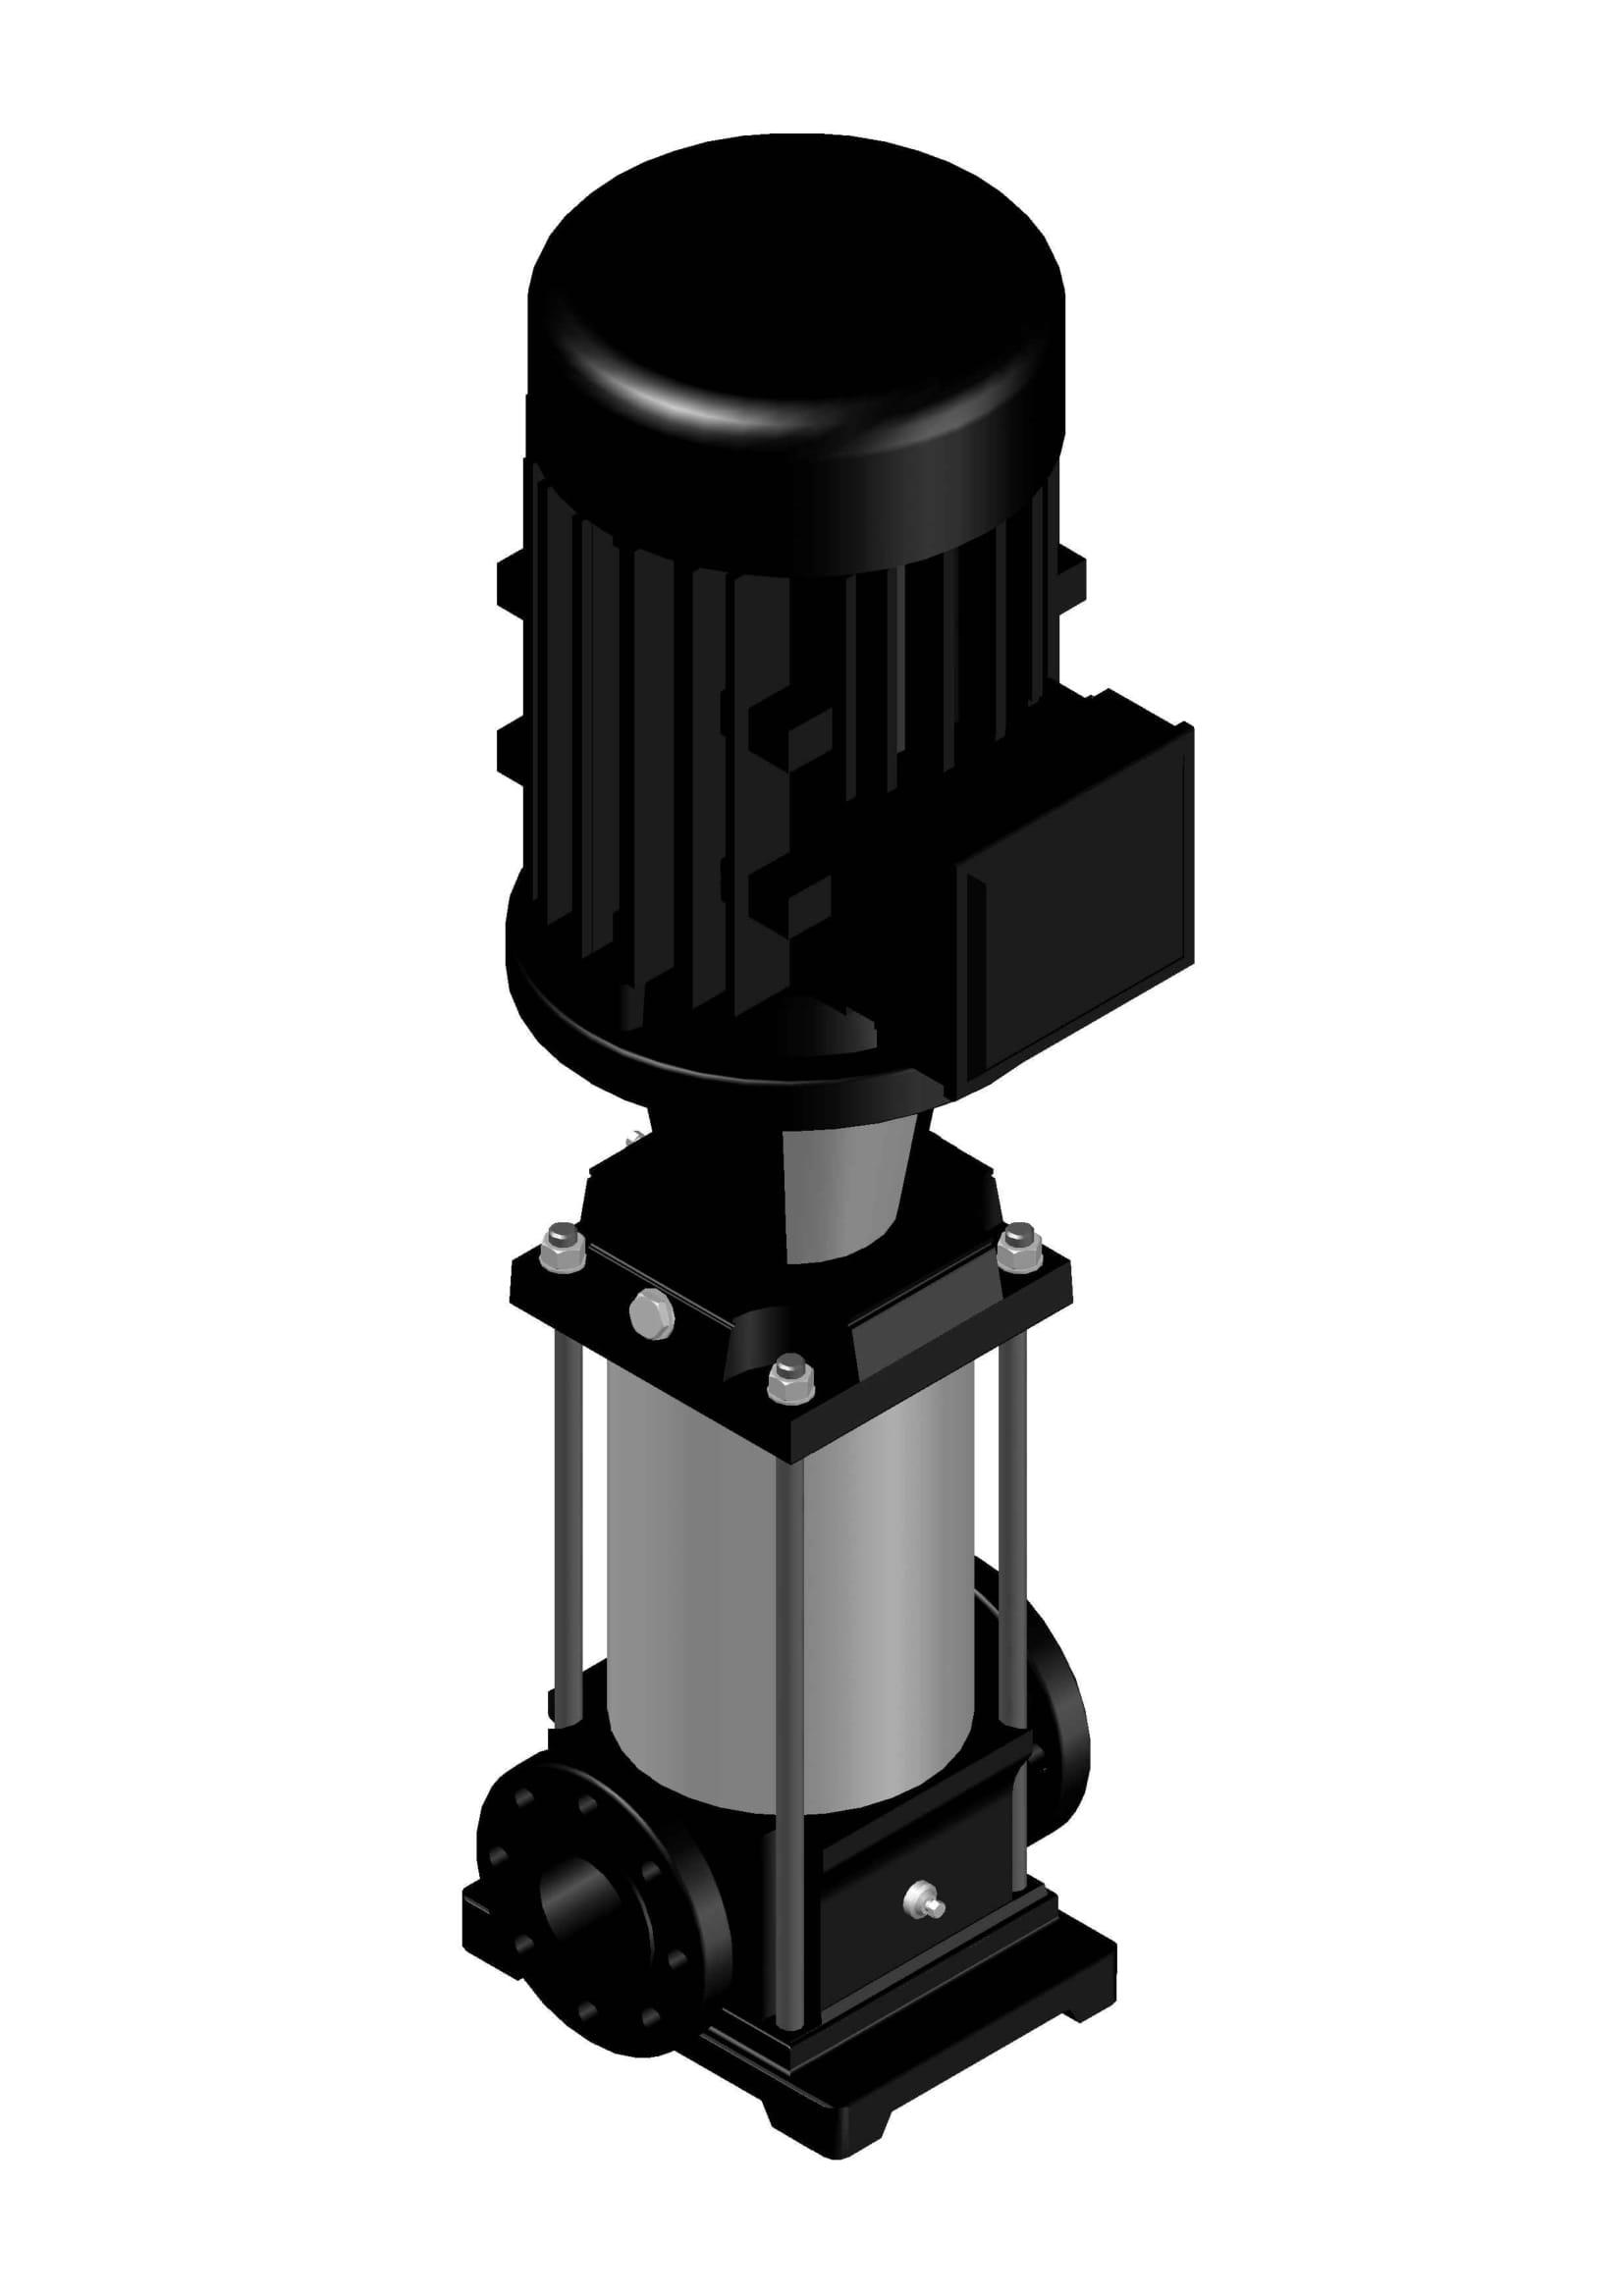 BV 45-04-02